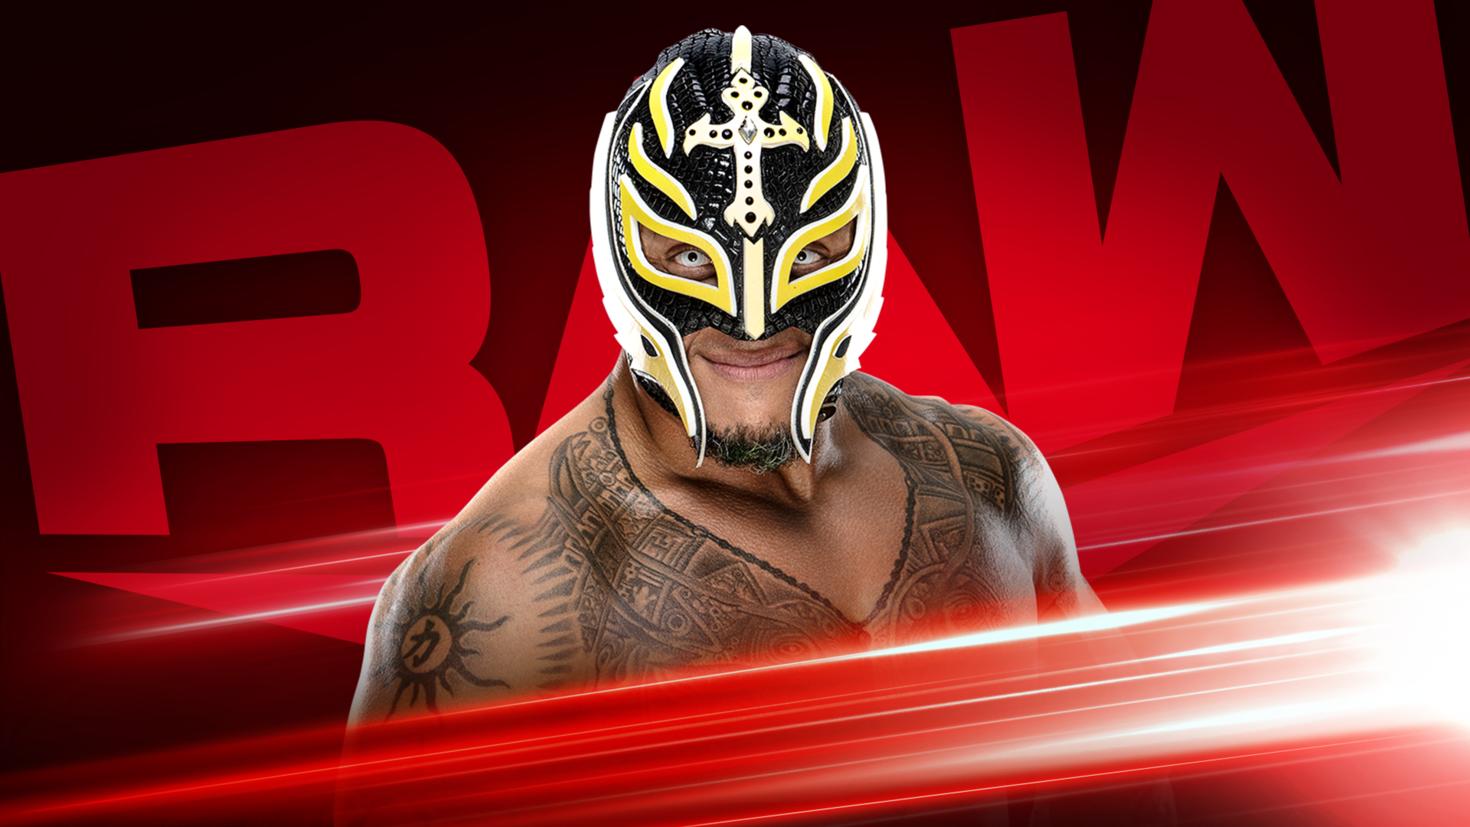 WWE Raw Preview (22/06/20): Charlotte-Asuka; Boss n Hug Connection-IIconics 2